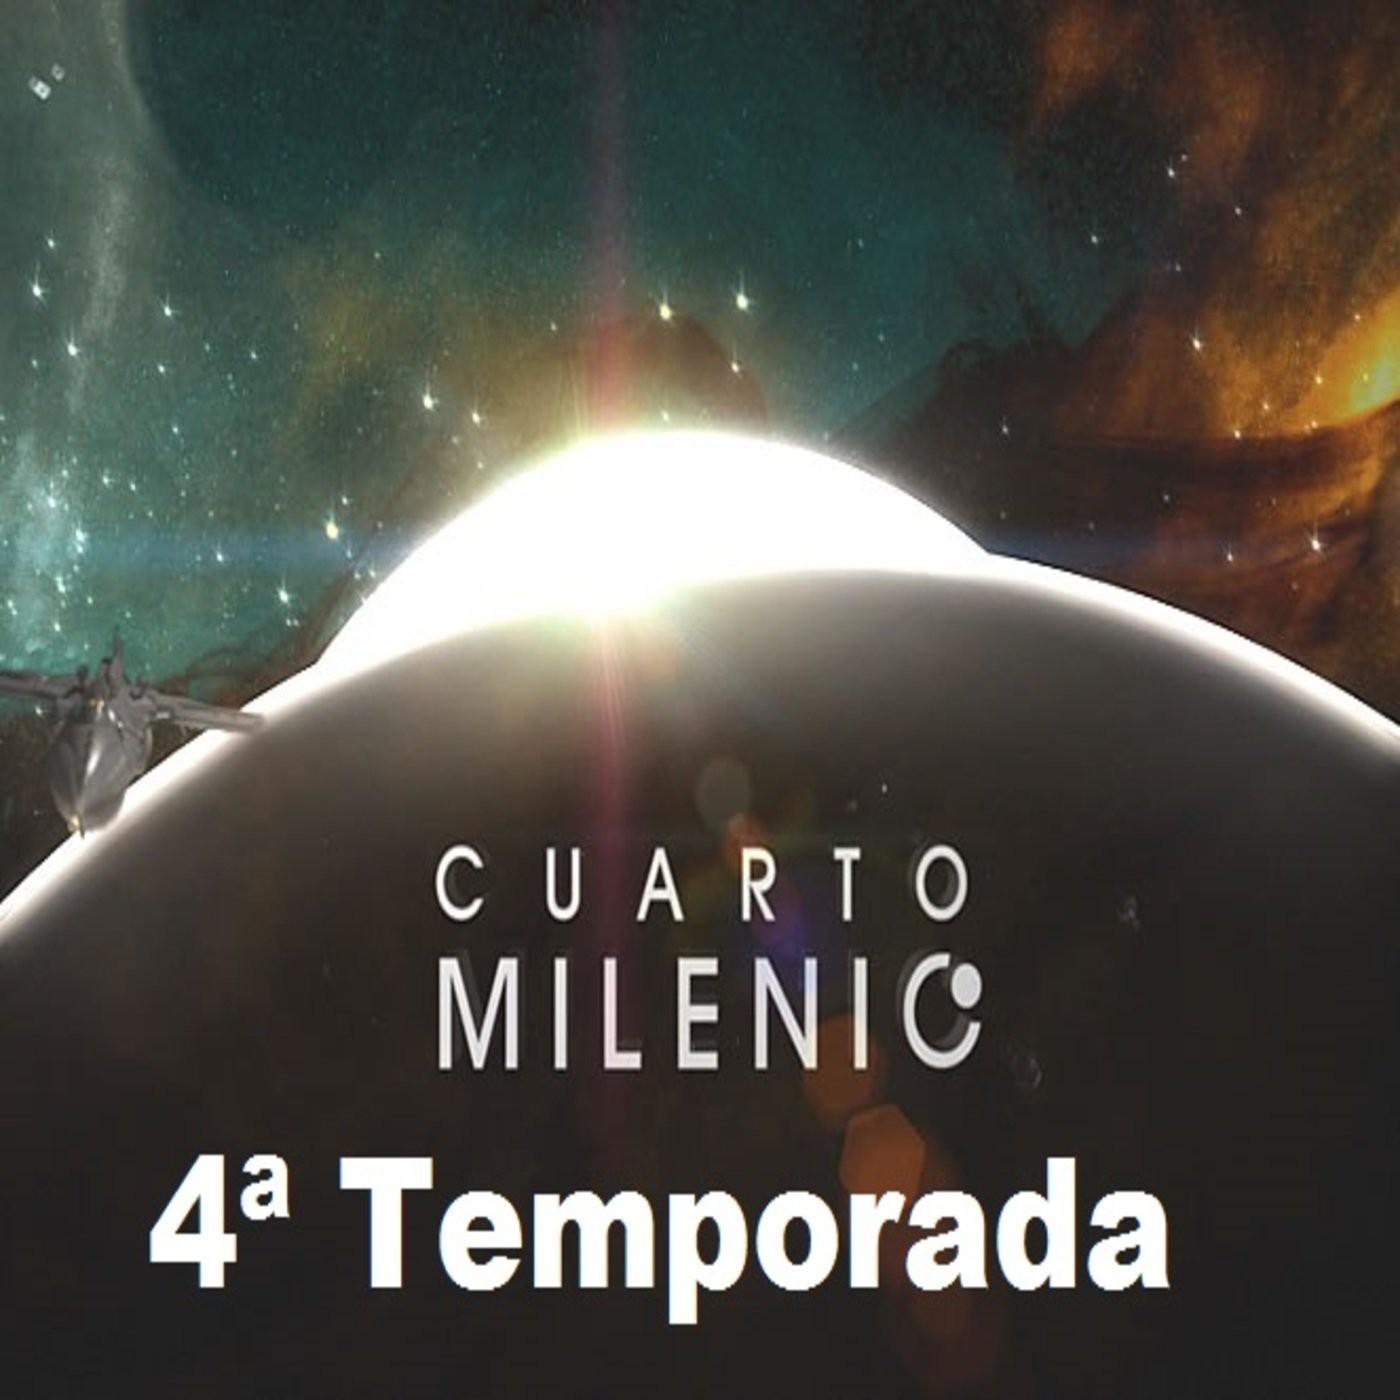 Cuarto Milenio -- Temporada 4/Programa 37 - La huella del otro